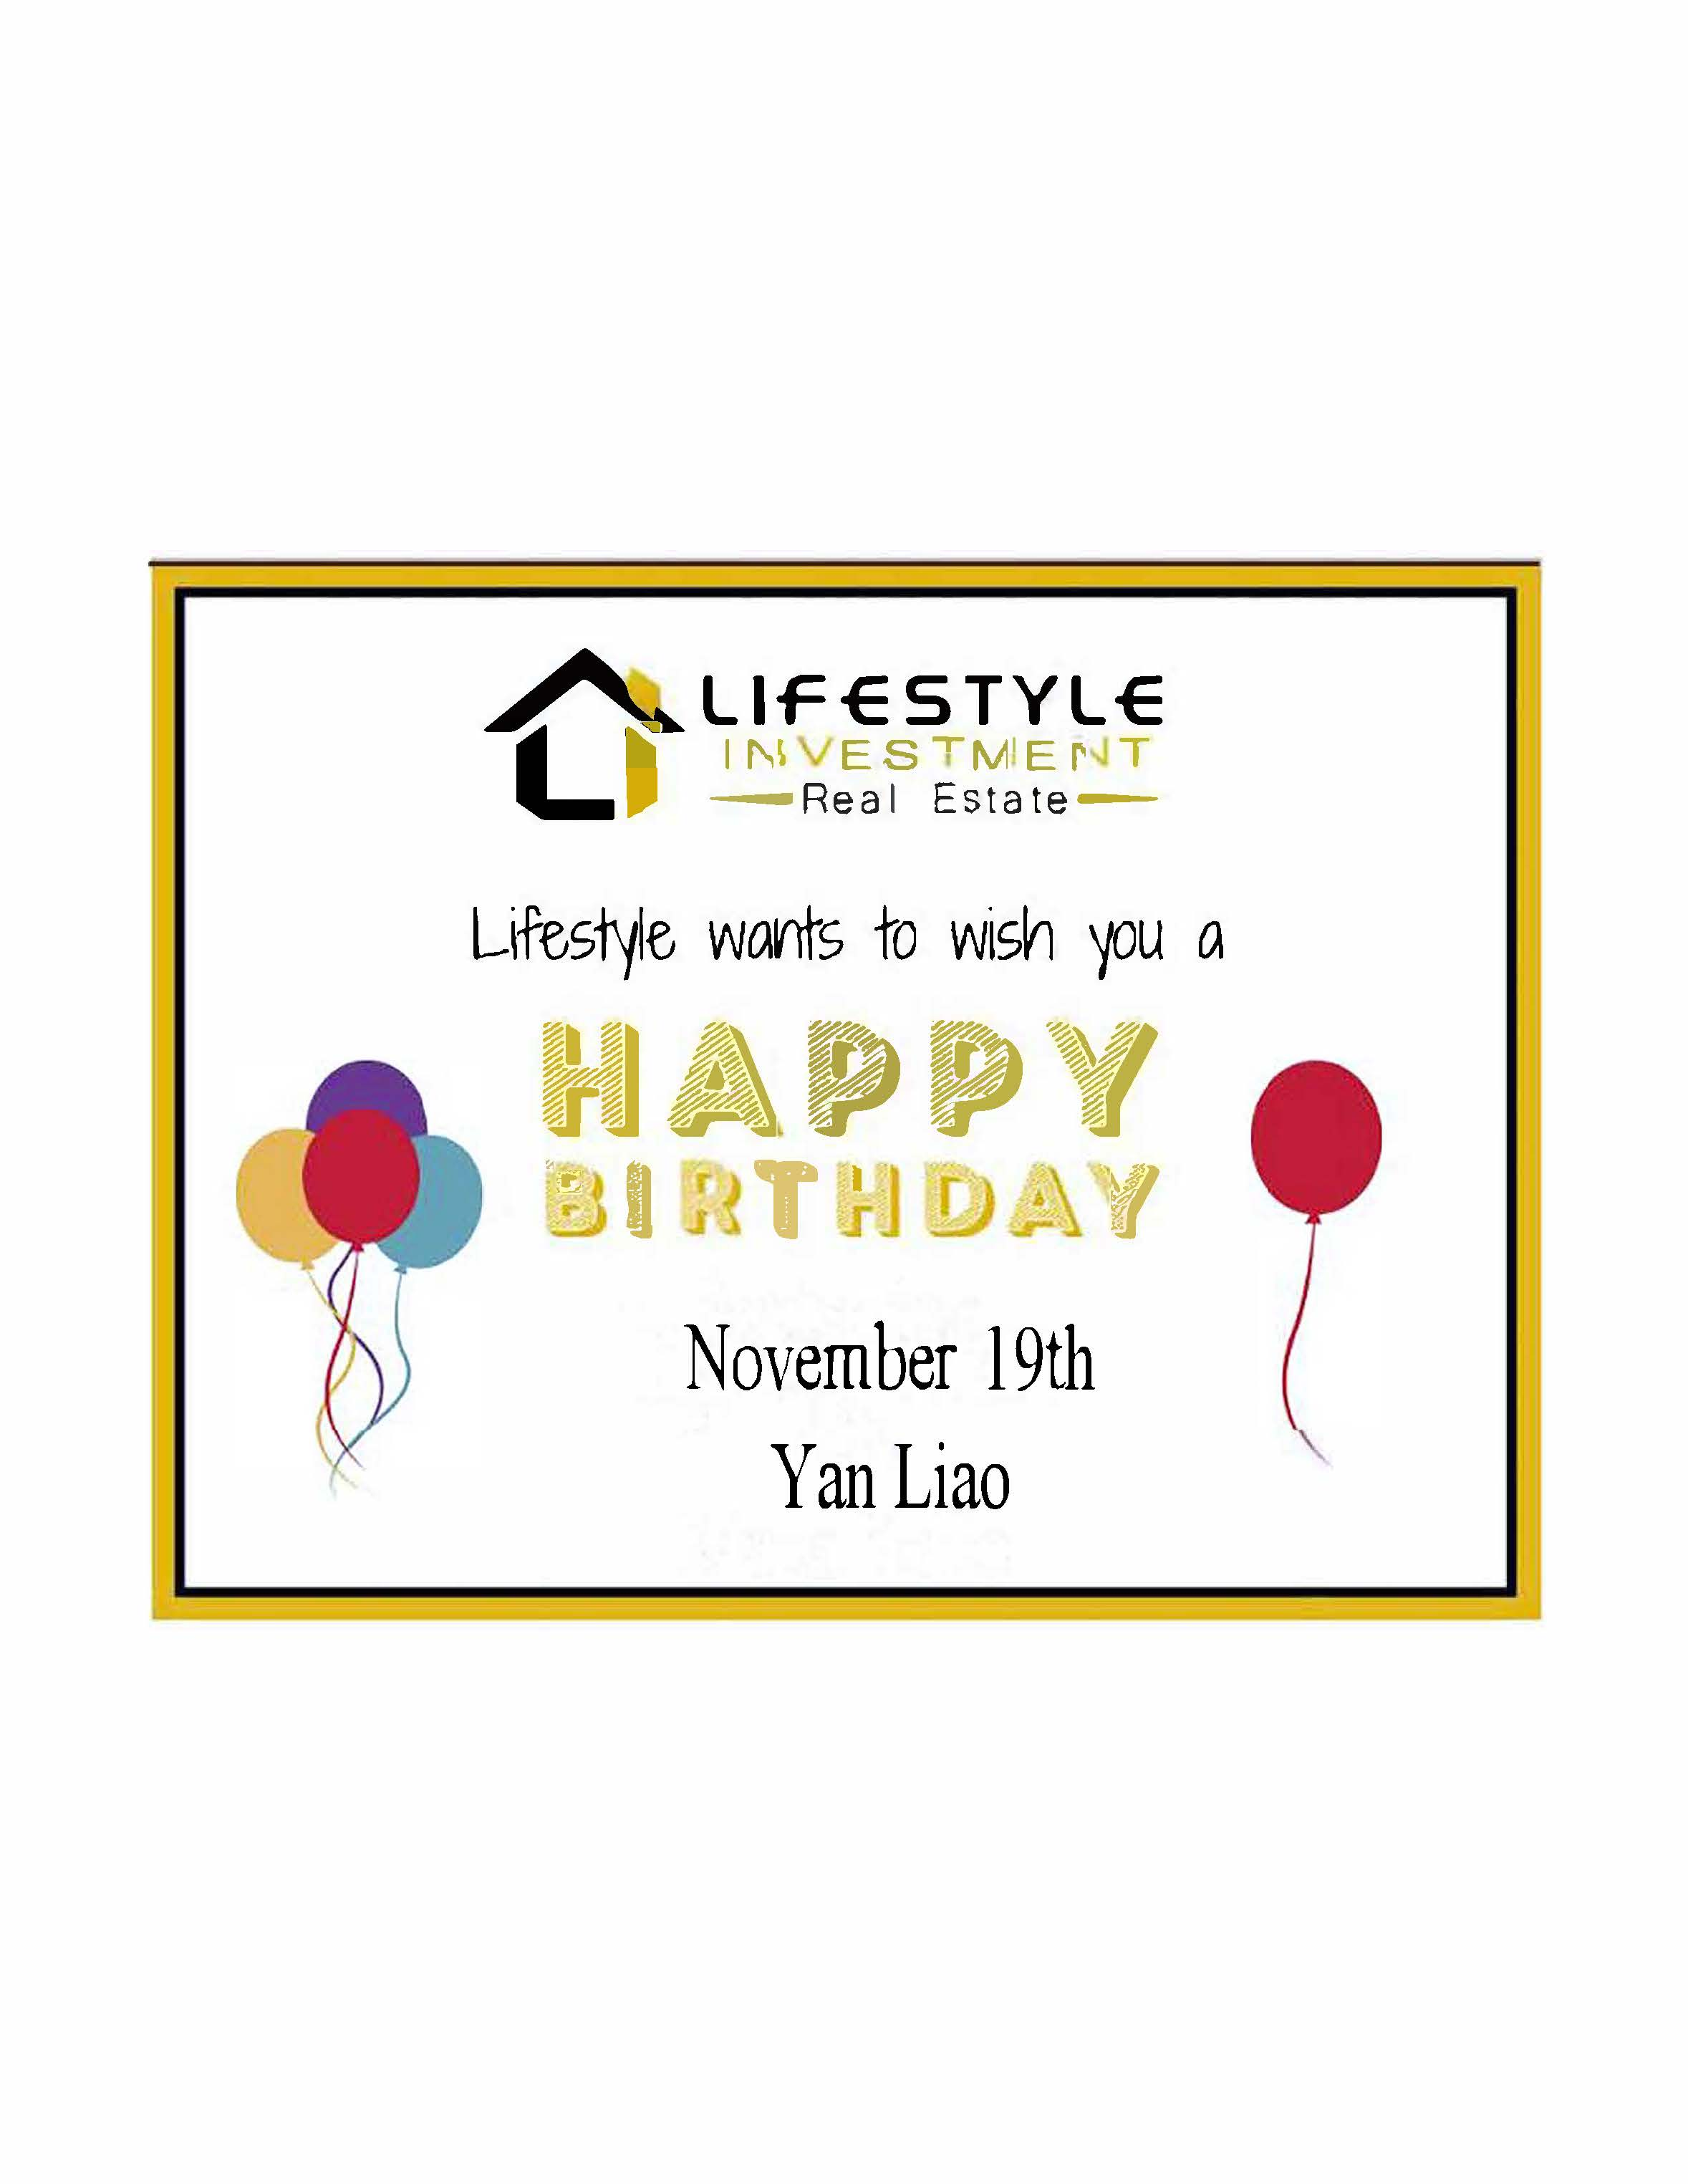 Yan Liao Birthday